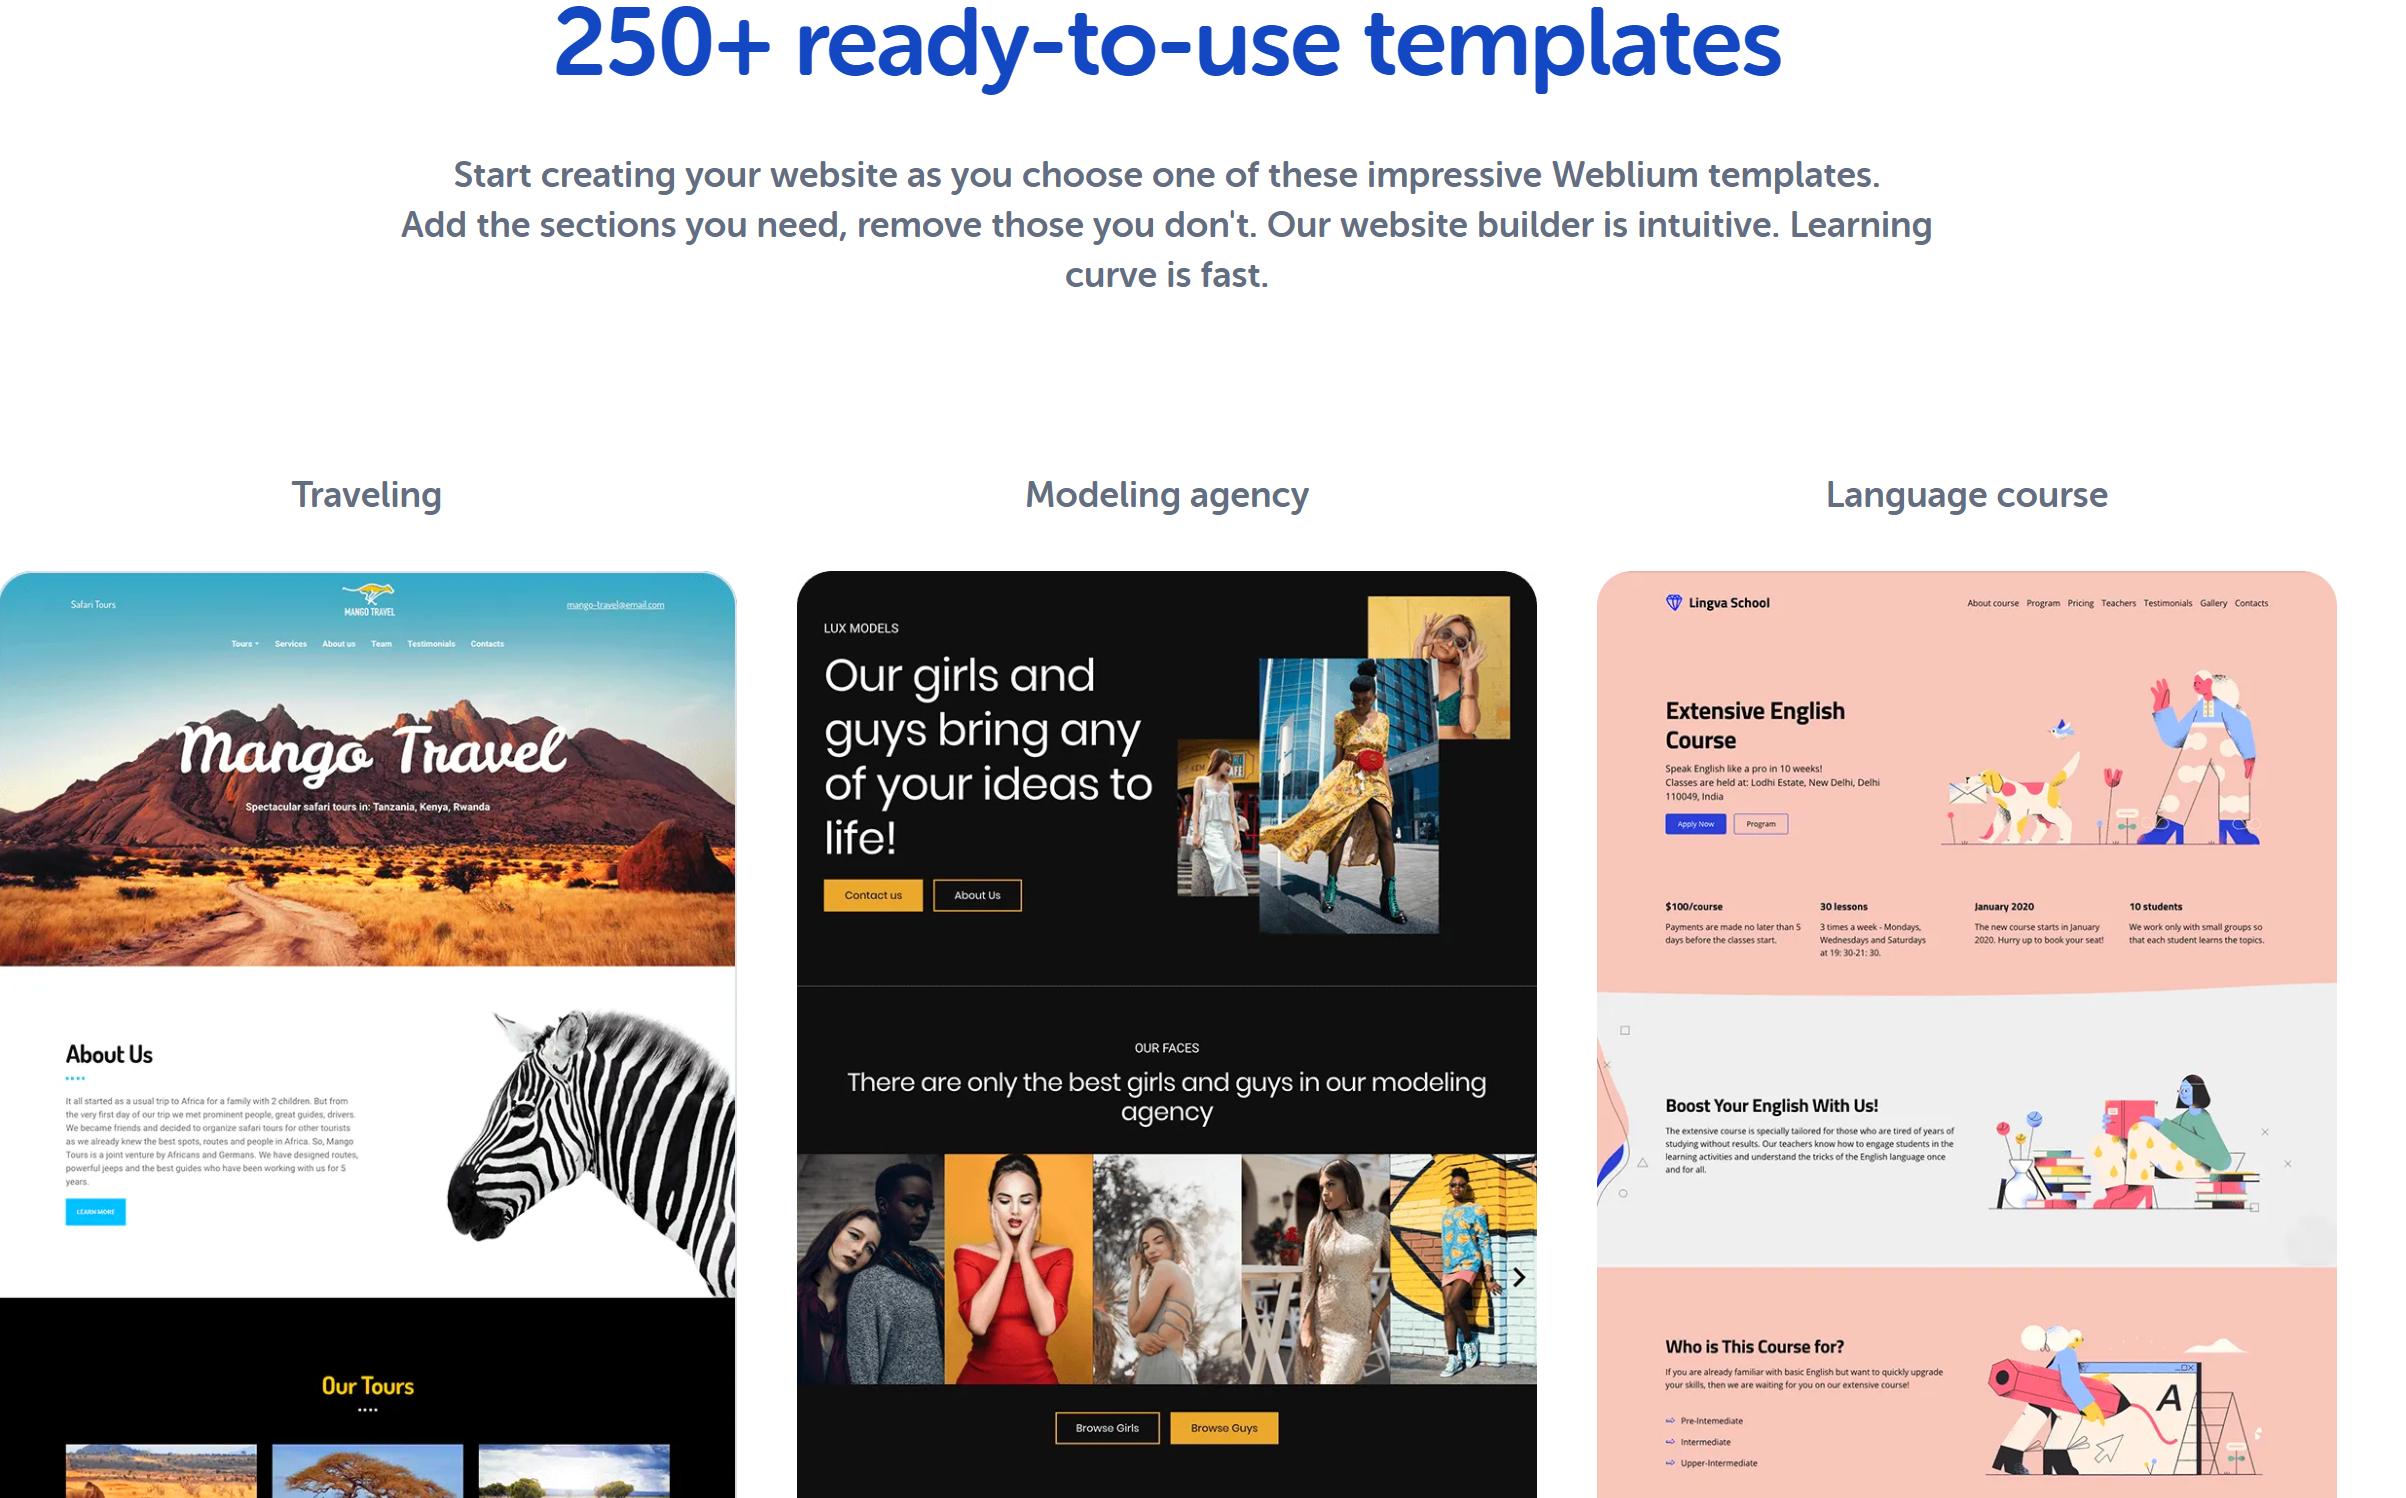 Weblium templates review